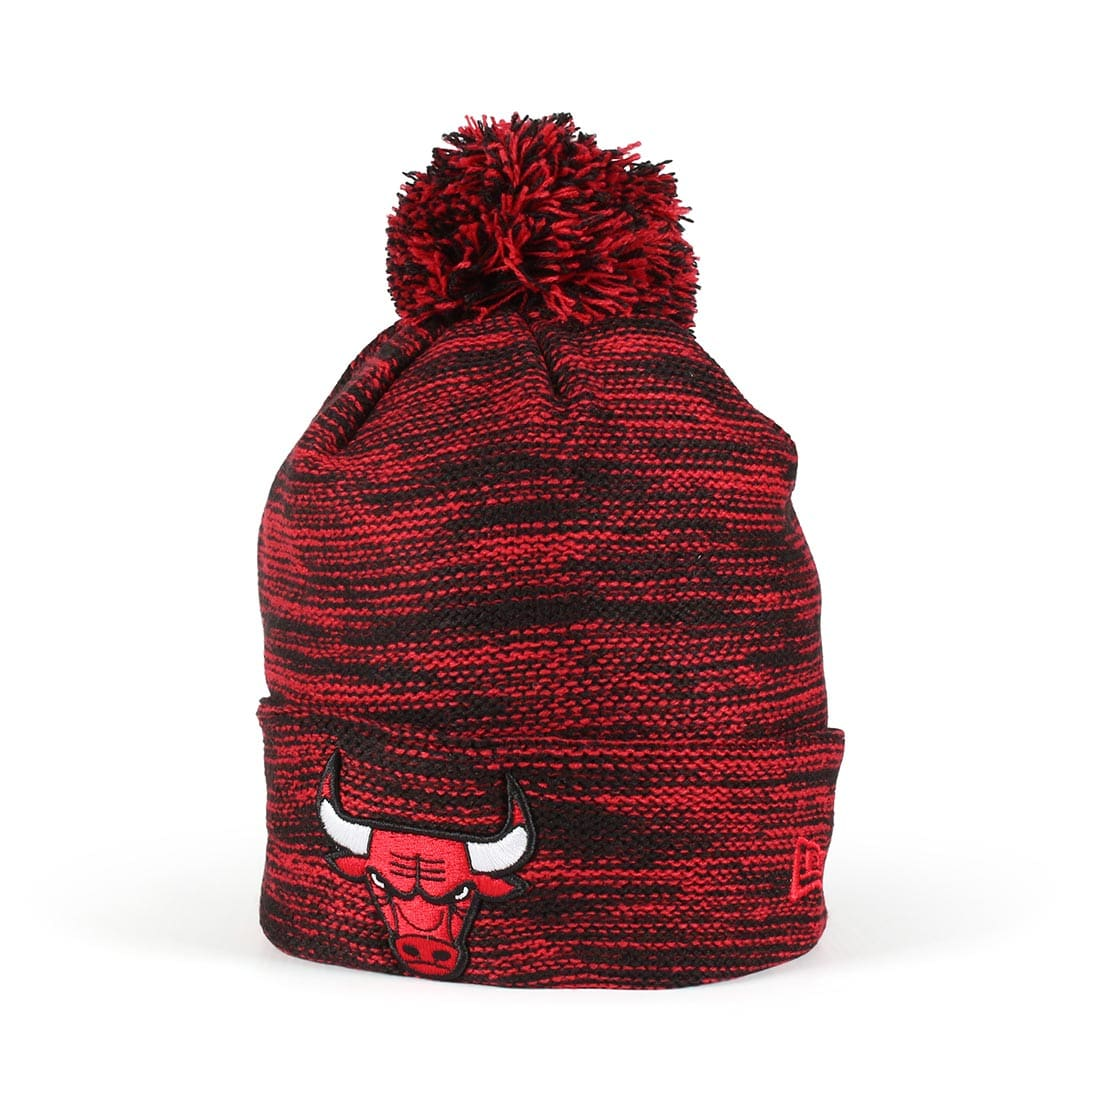 8d093f72 New Era Chicago Bulls Marl Knit Beanie – Black / Red